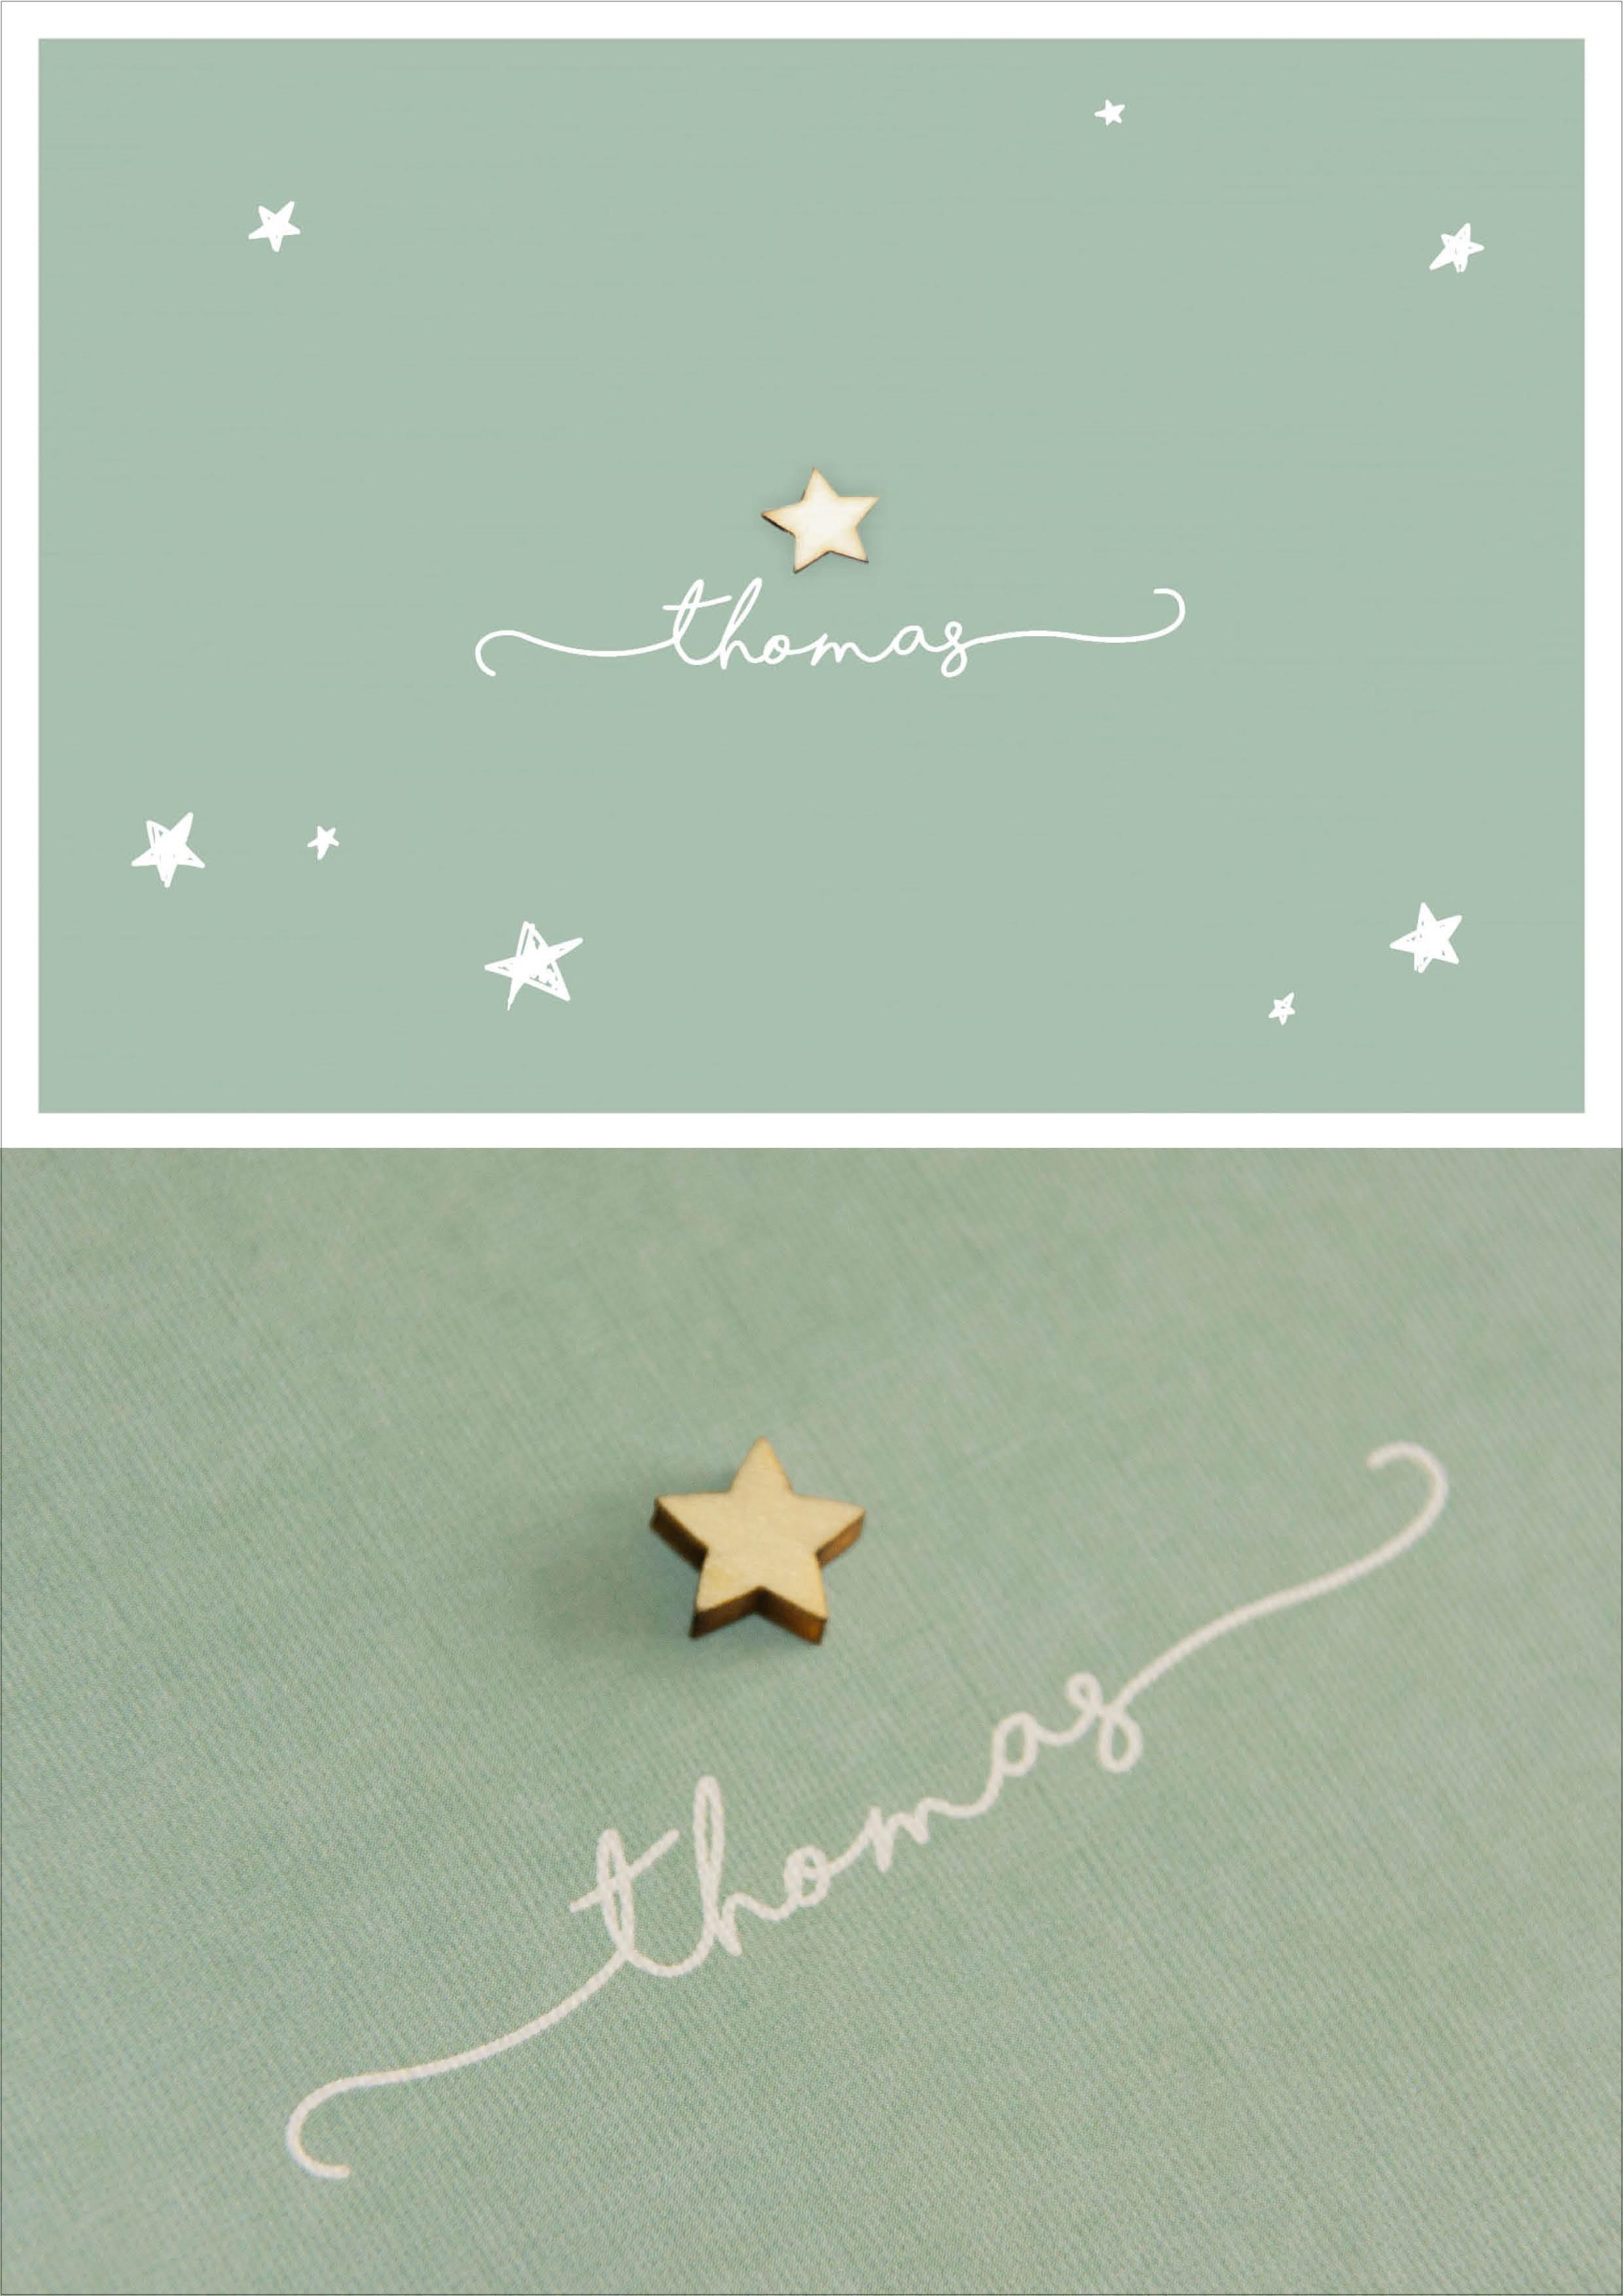 Rustiek - houten ster - jongen - geboortekaartje - oud groen - sterretjes